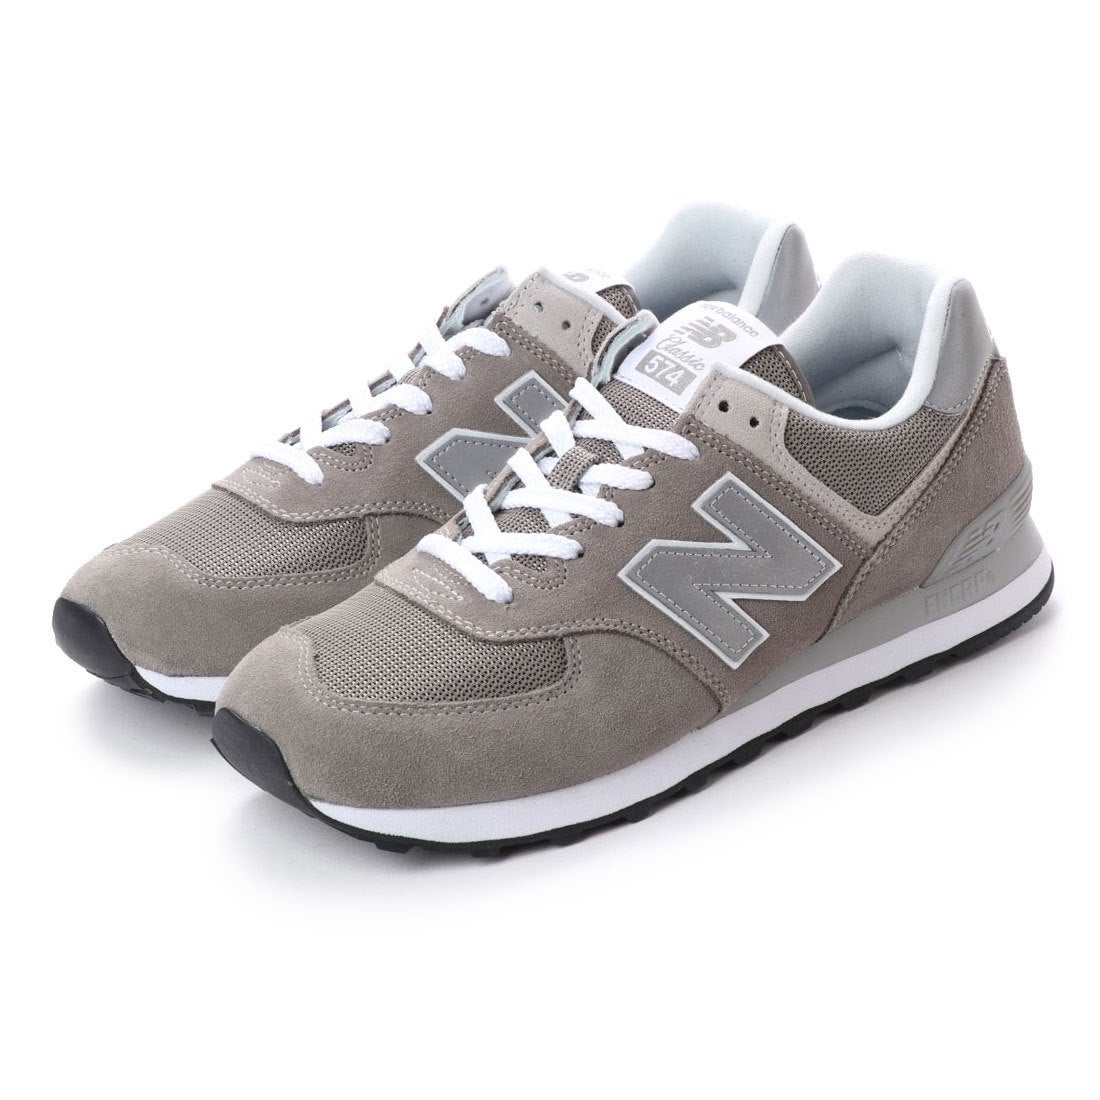 f1ed64e8ec648 new balance ニューバランス NEW BALANCE メンズ スニーカー ML574 ML574D 6296 -靴&ファッション通販  ロコンド〜自宅で試着、気軽に返品